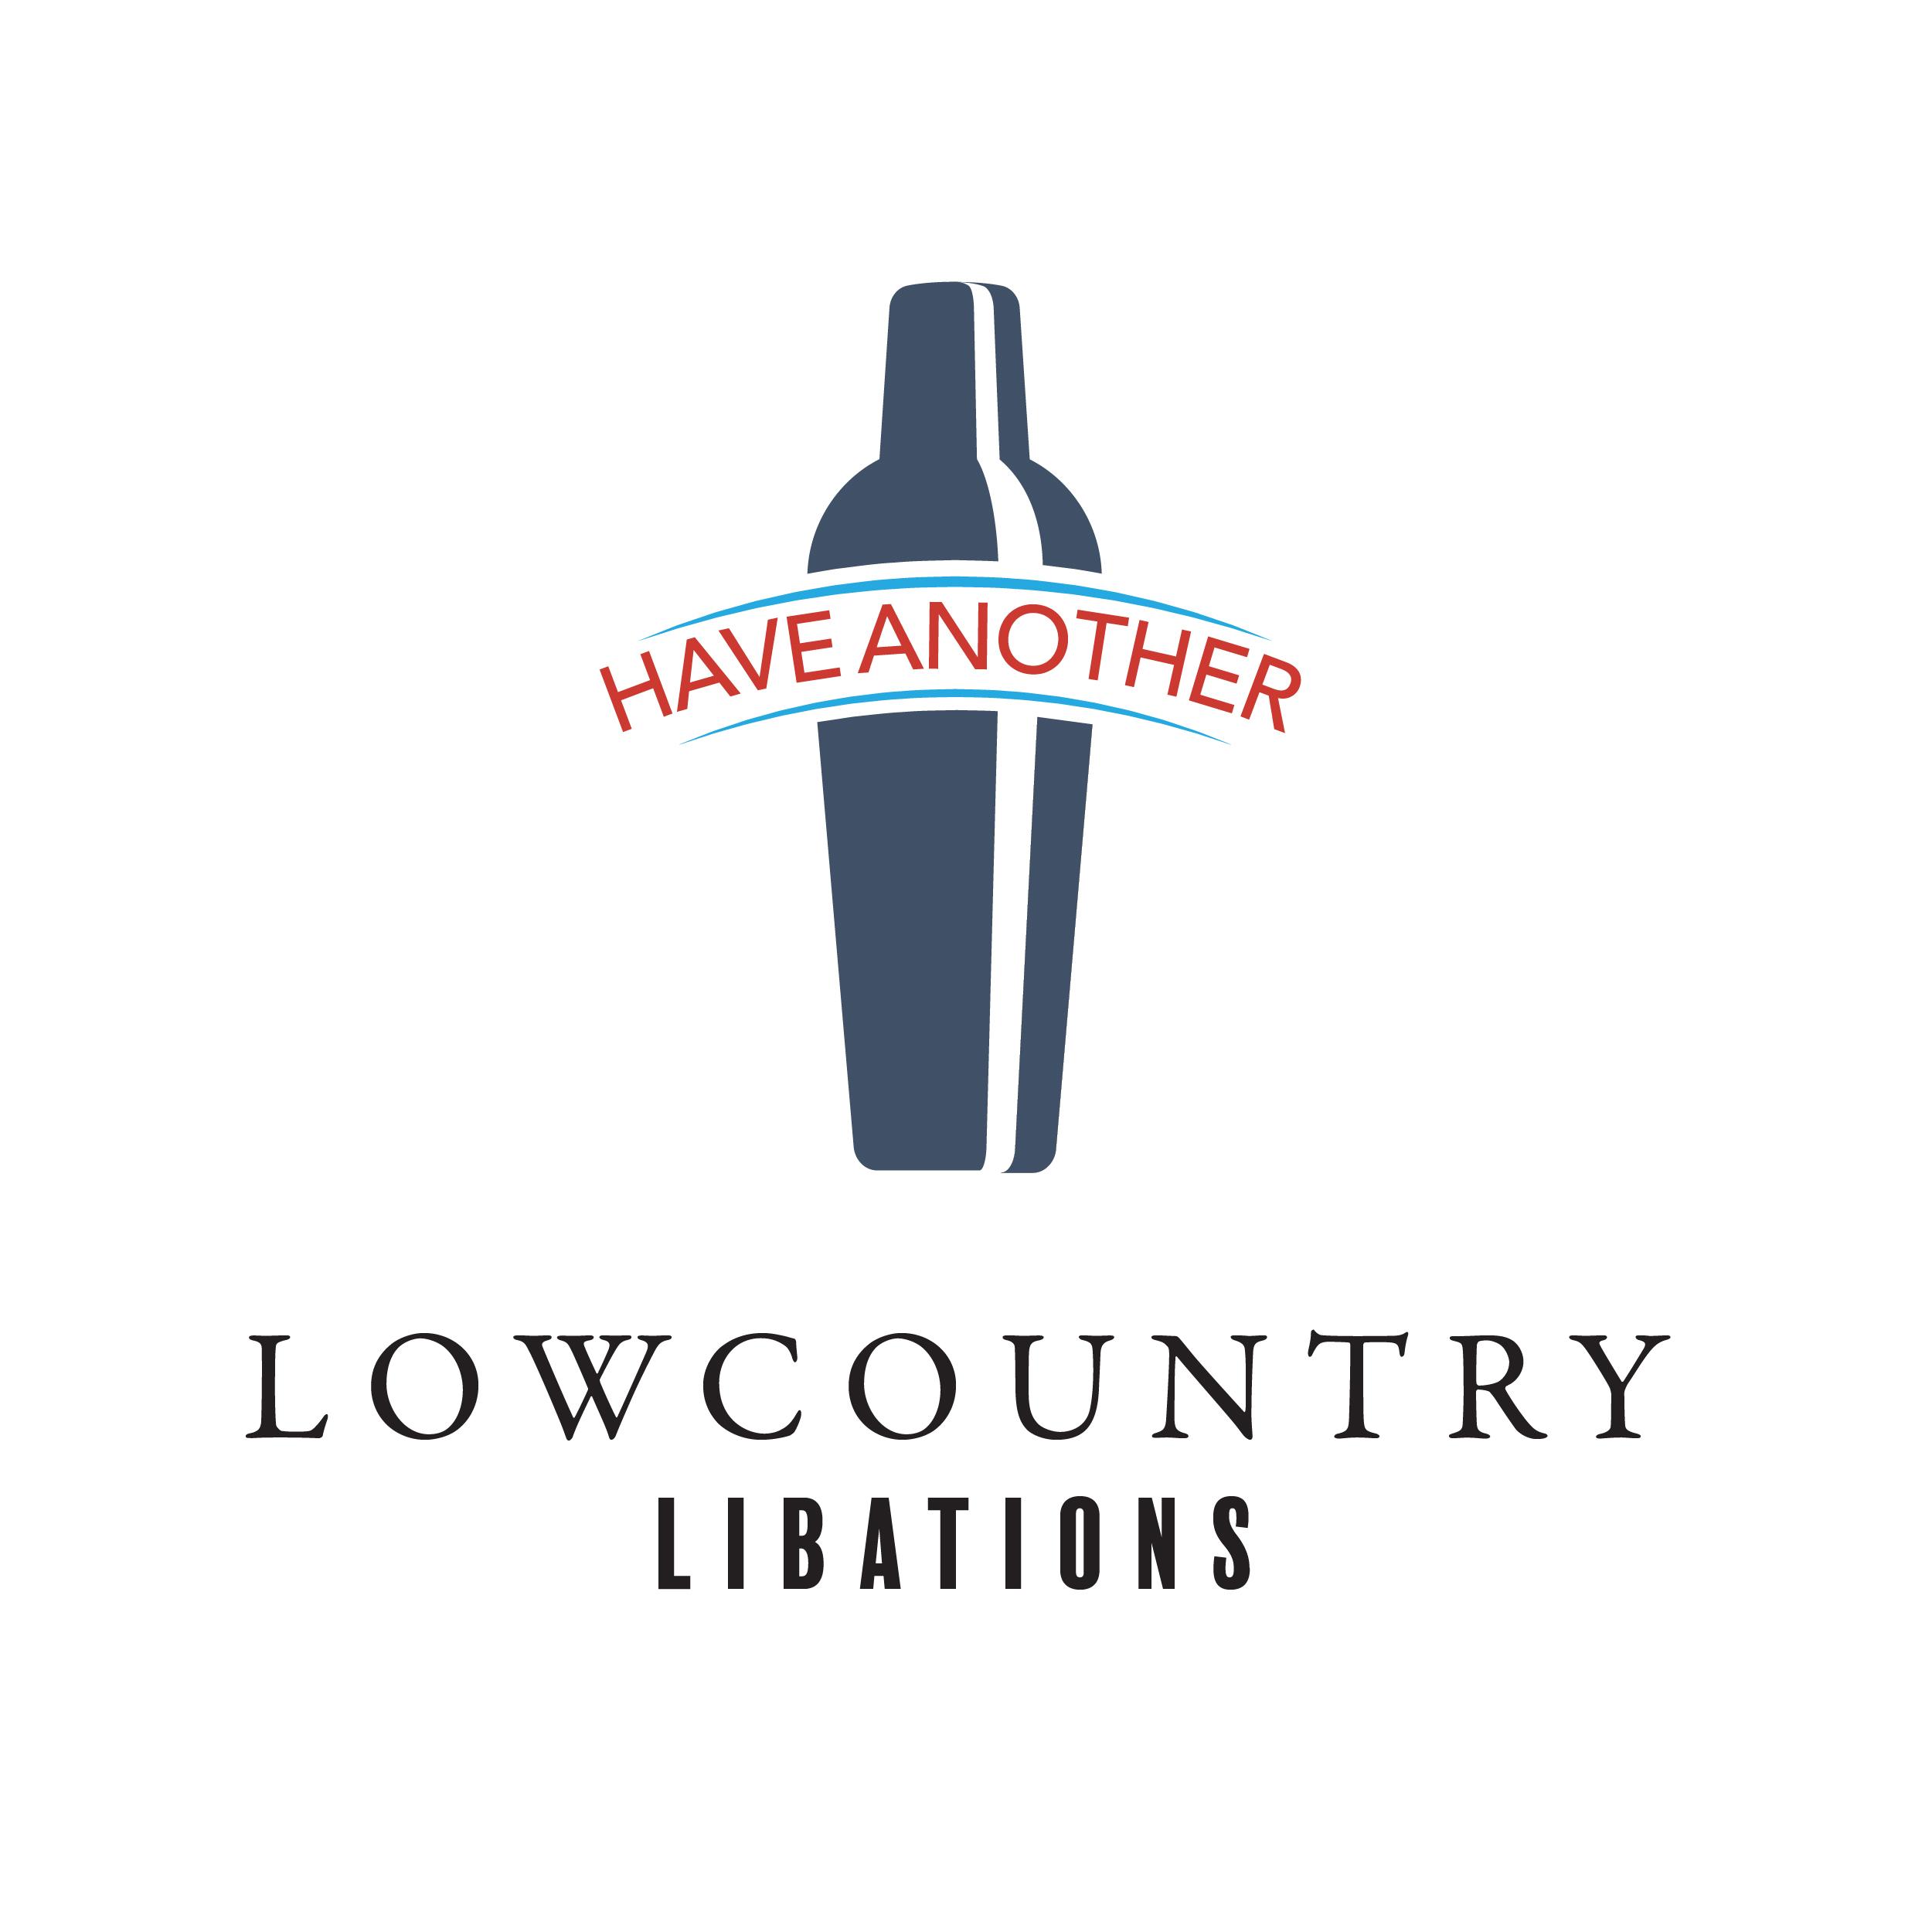 Lowcountry Kitchen Libations Logo